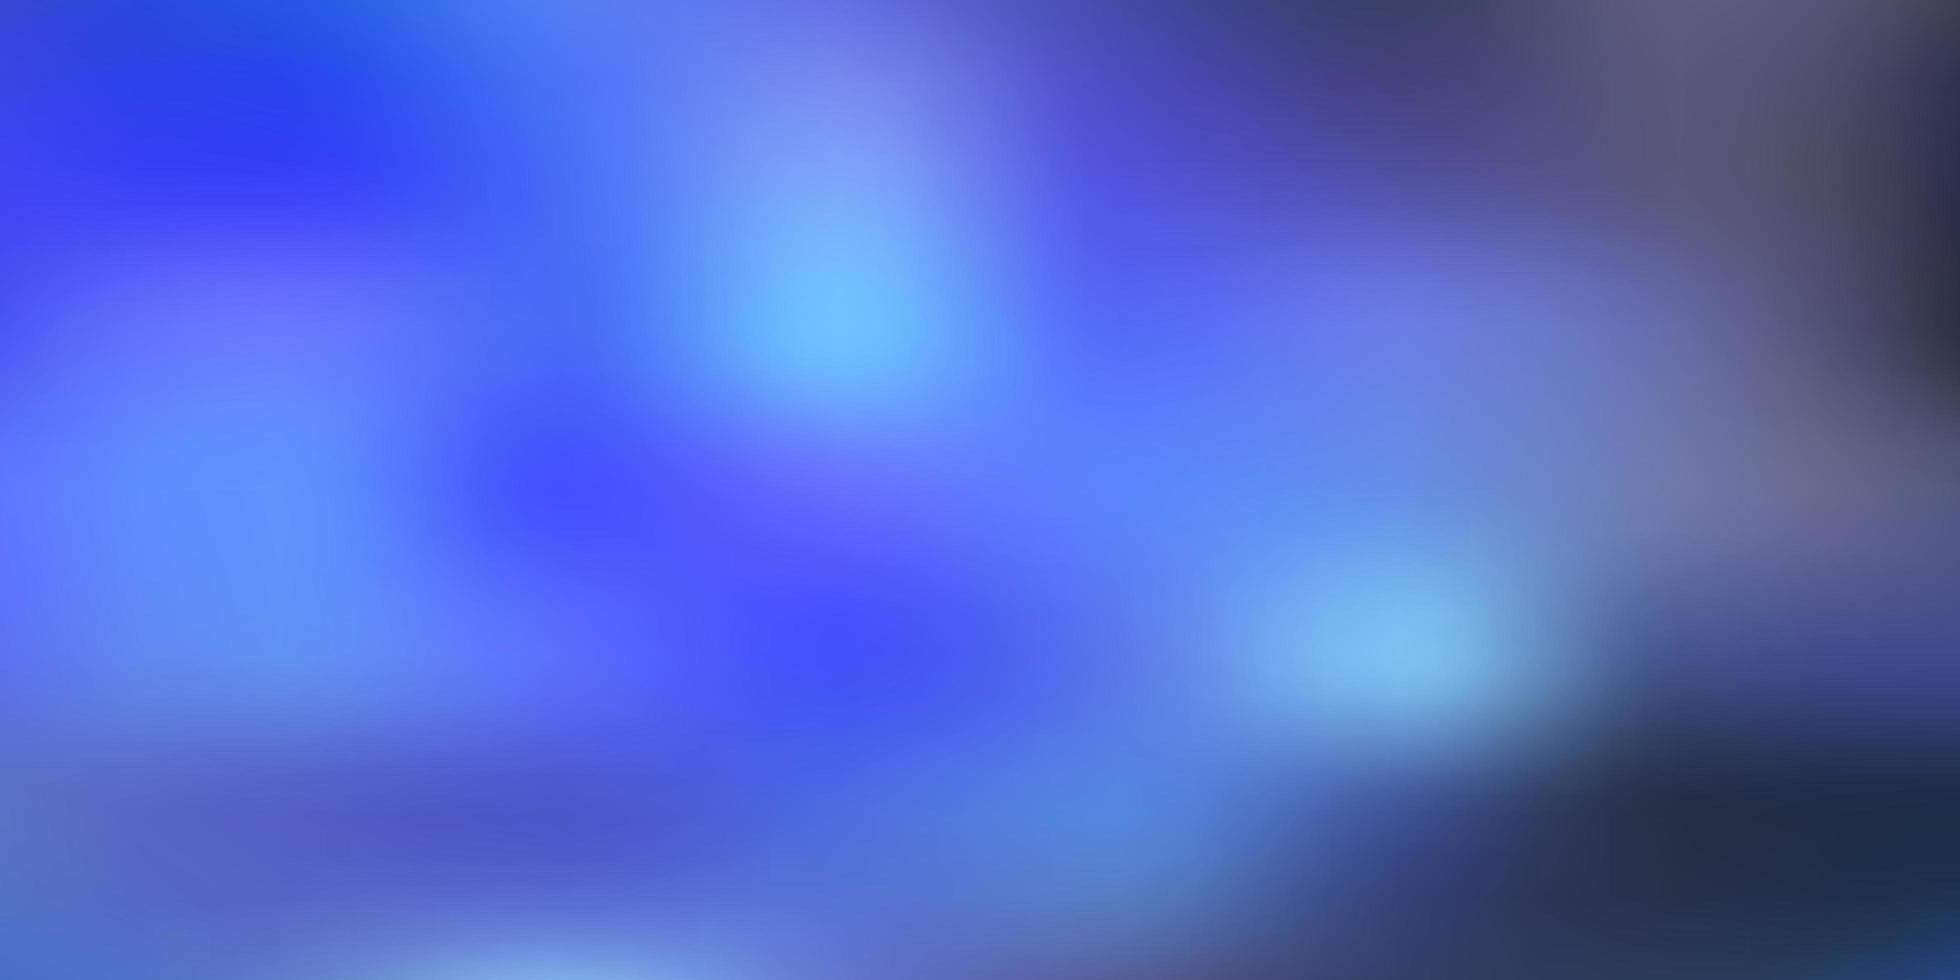 luz azul vetor turva padrão.